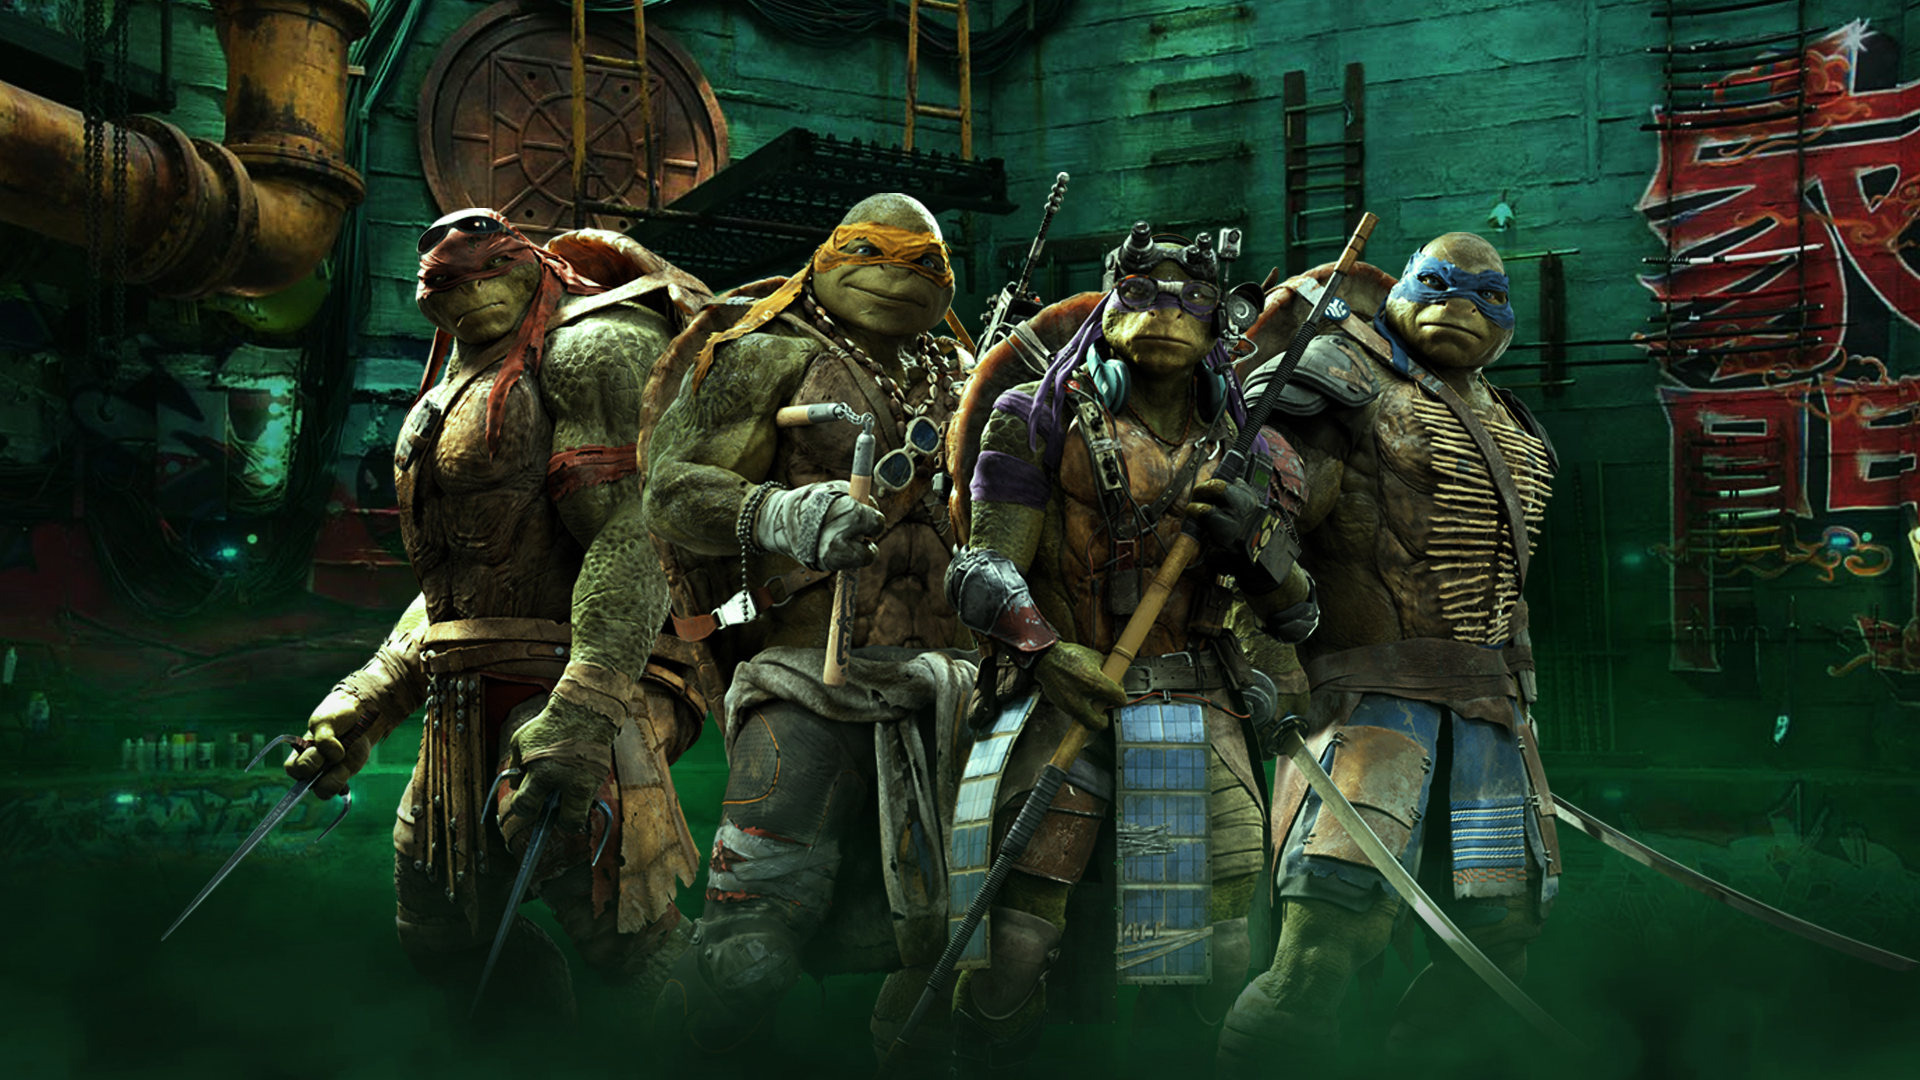 41 Ninja Turtles 2014 Wallpaper On Wallpapersafari